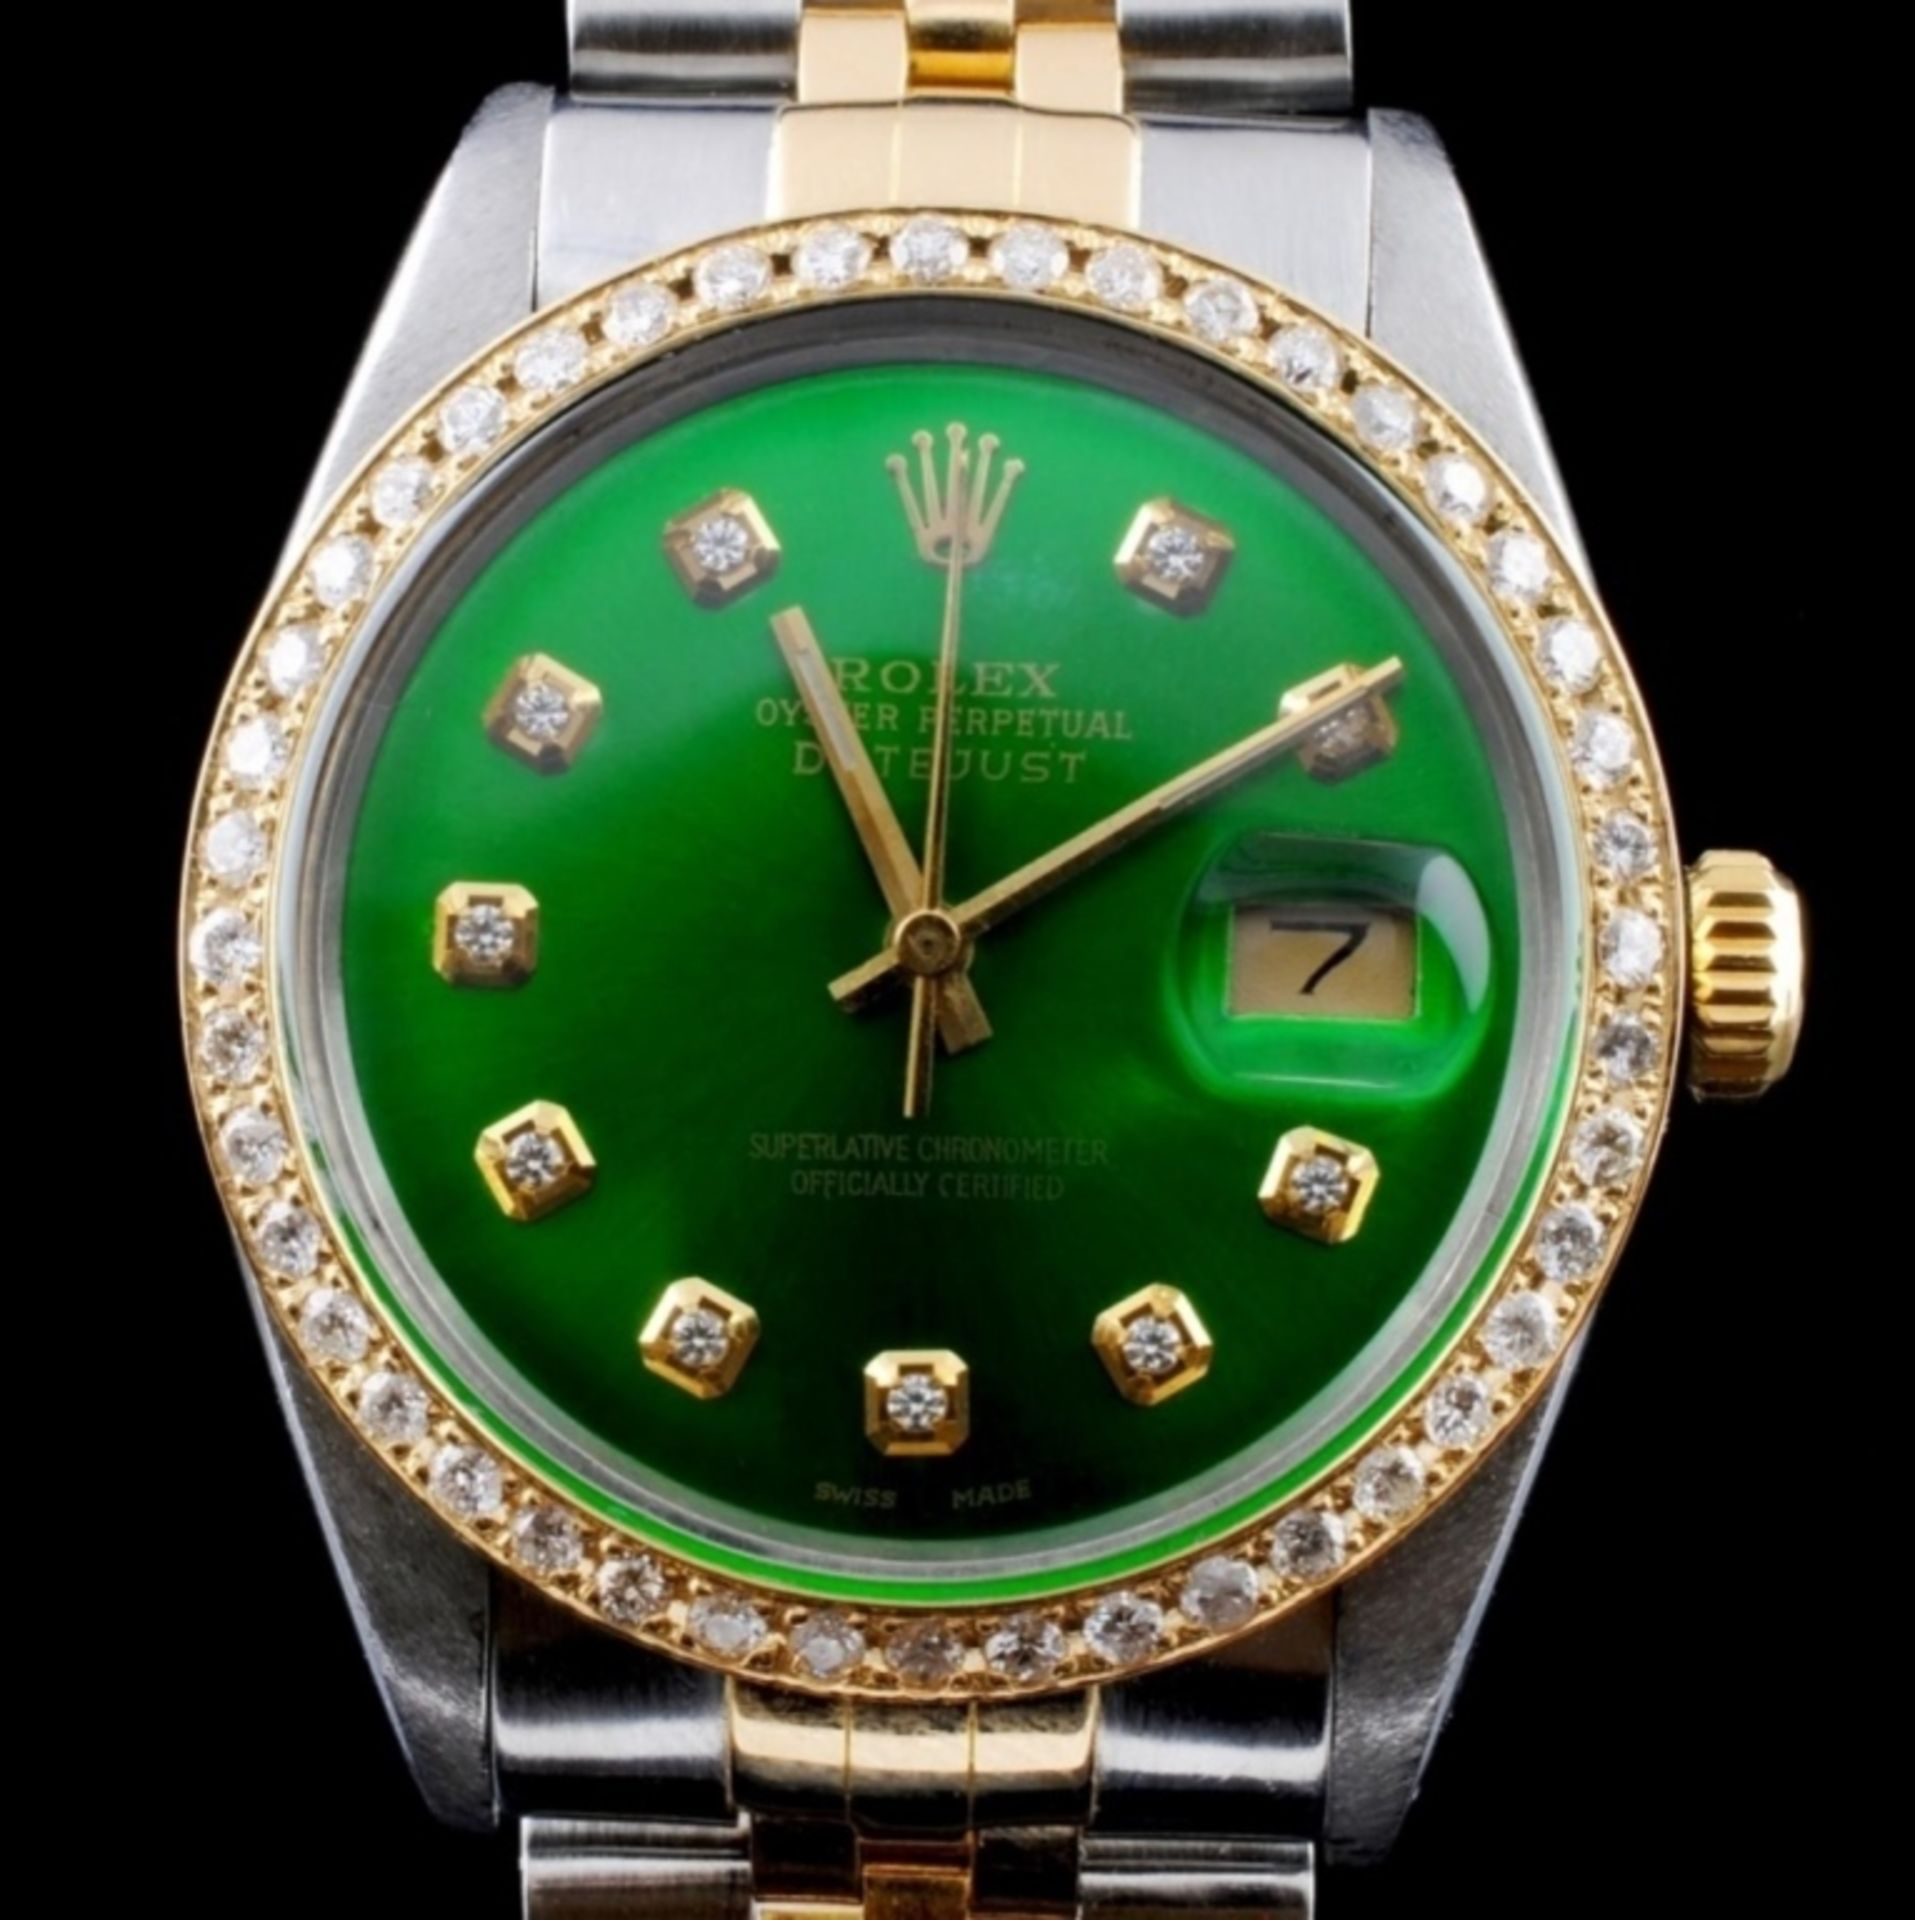 Rolex YG/SS DateJust Diamond 36MM Watch - Image 3 of 6